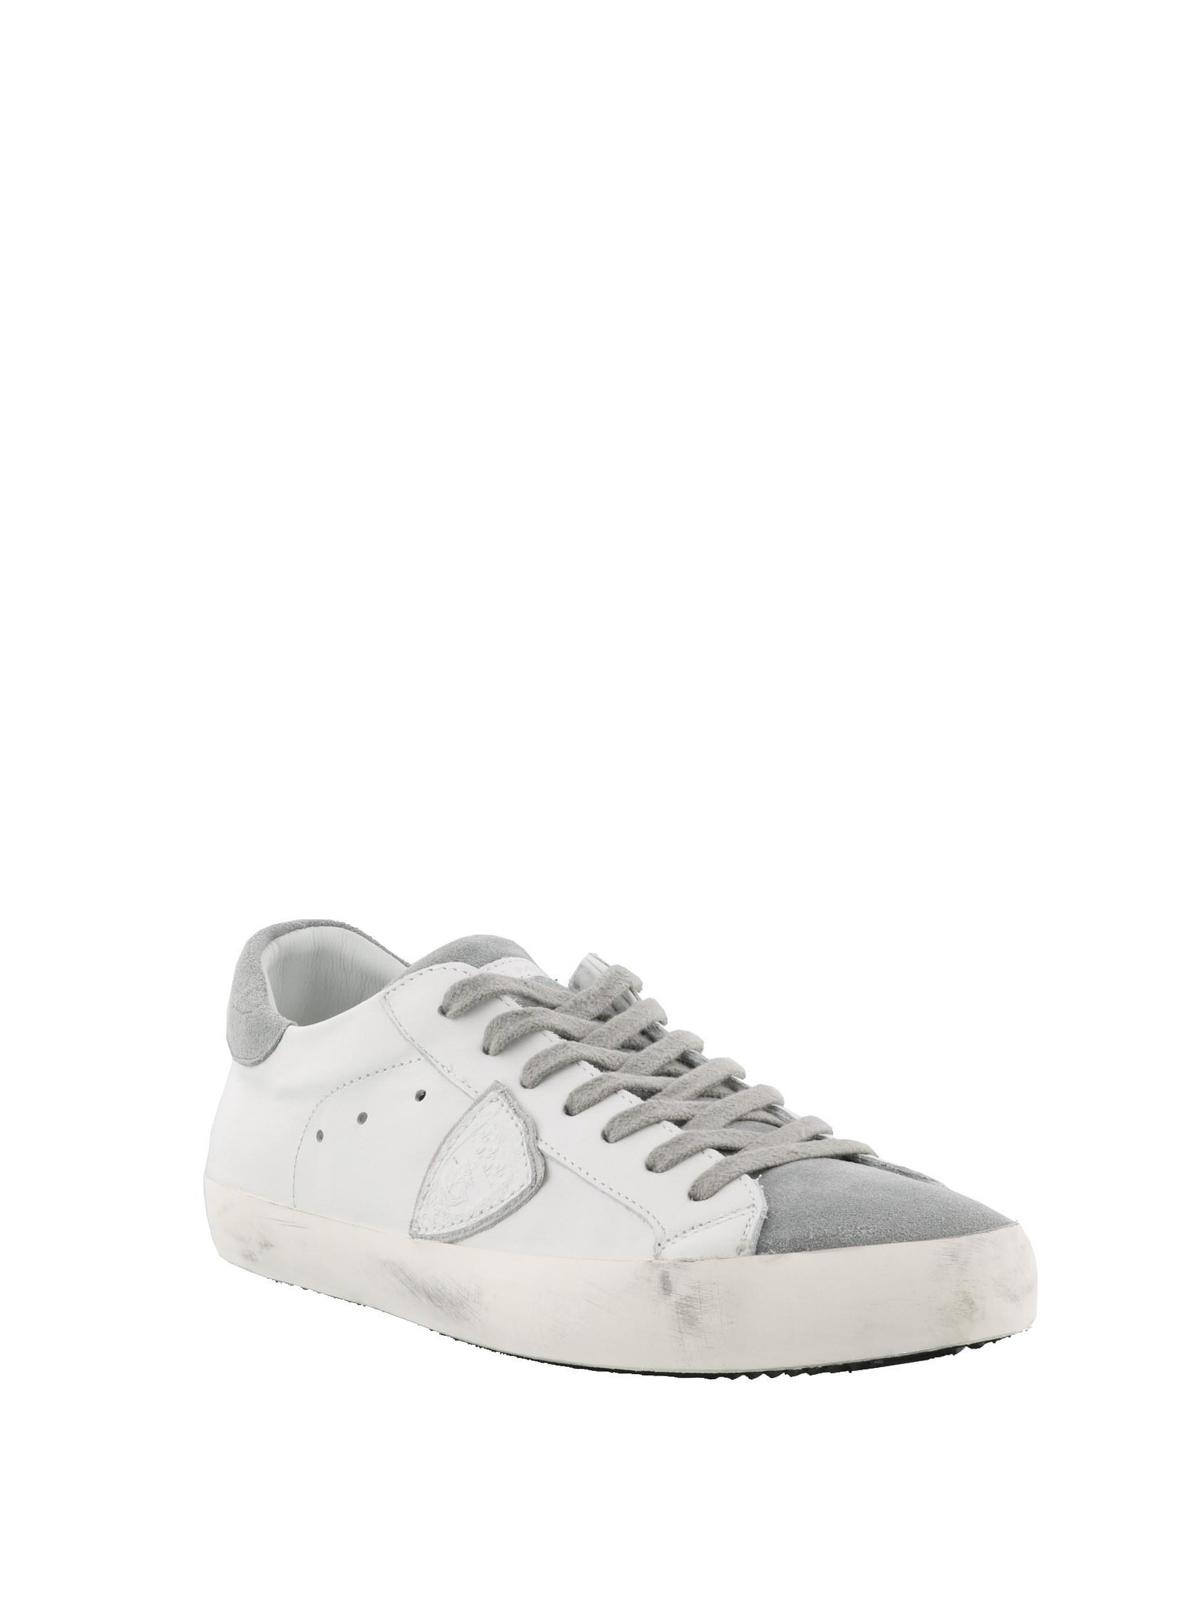 PHILIPPE MODEL  sneakers online - Sneaker Paris basse in suede bianco e  grigio 16303ae84a3